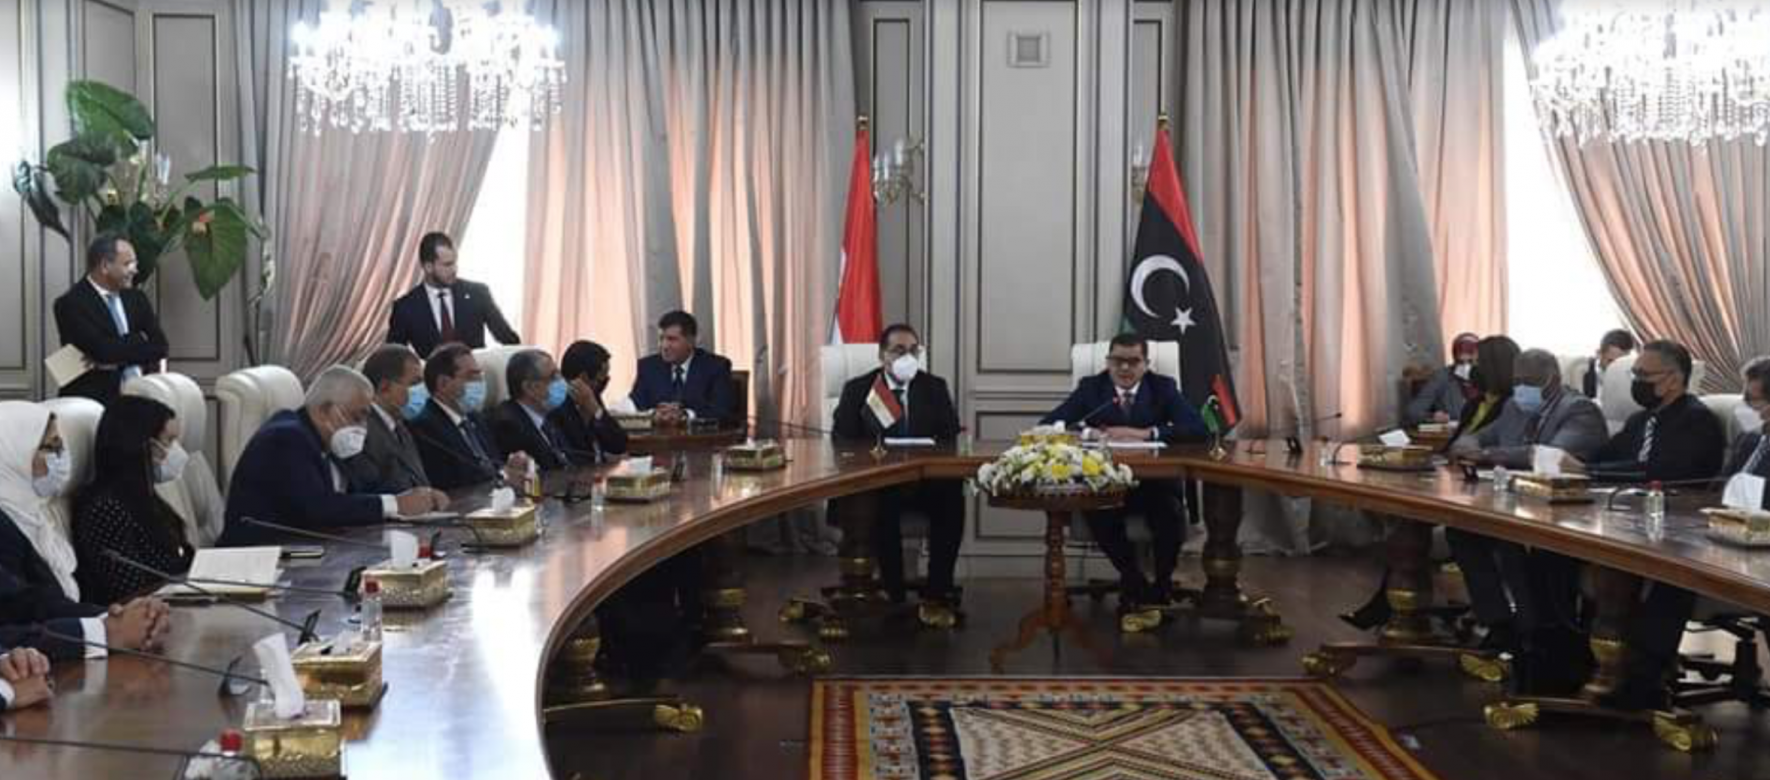 Egypt and Libya signed 11 memoranda of understanding to strengthen bilateral cooperation